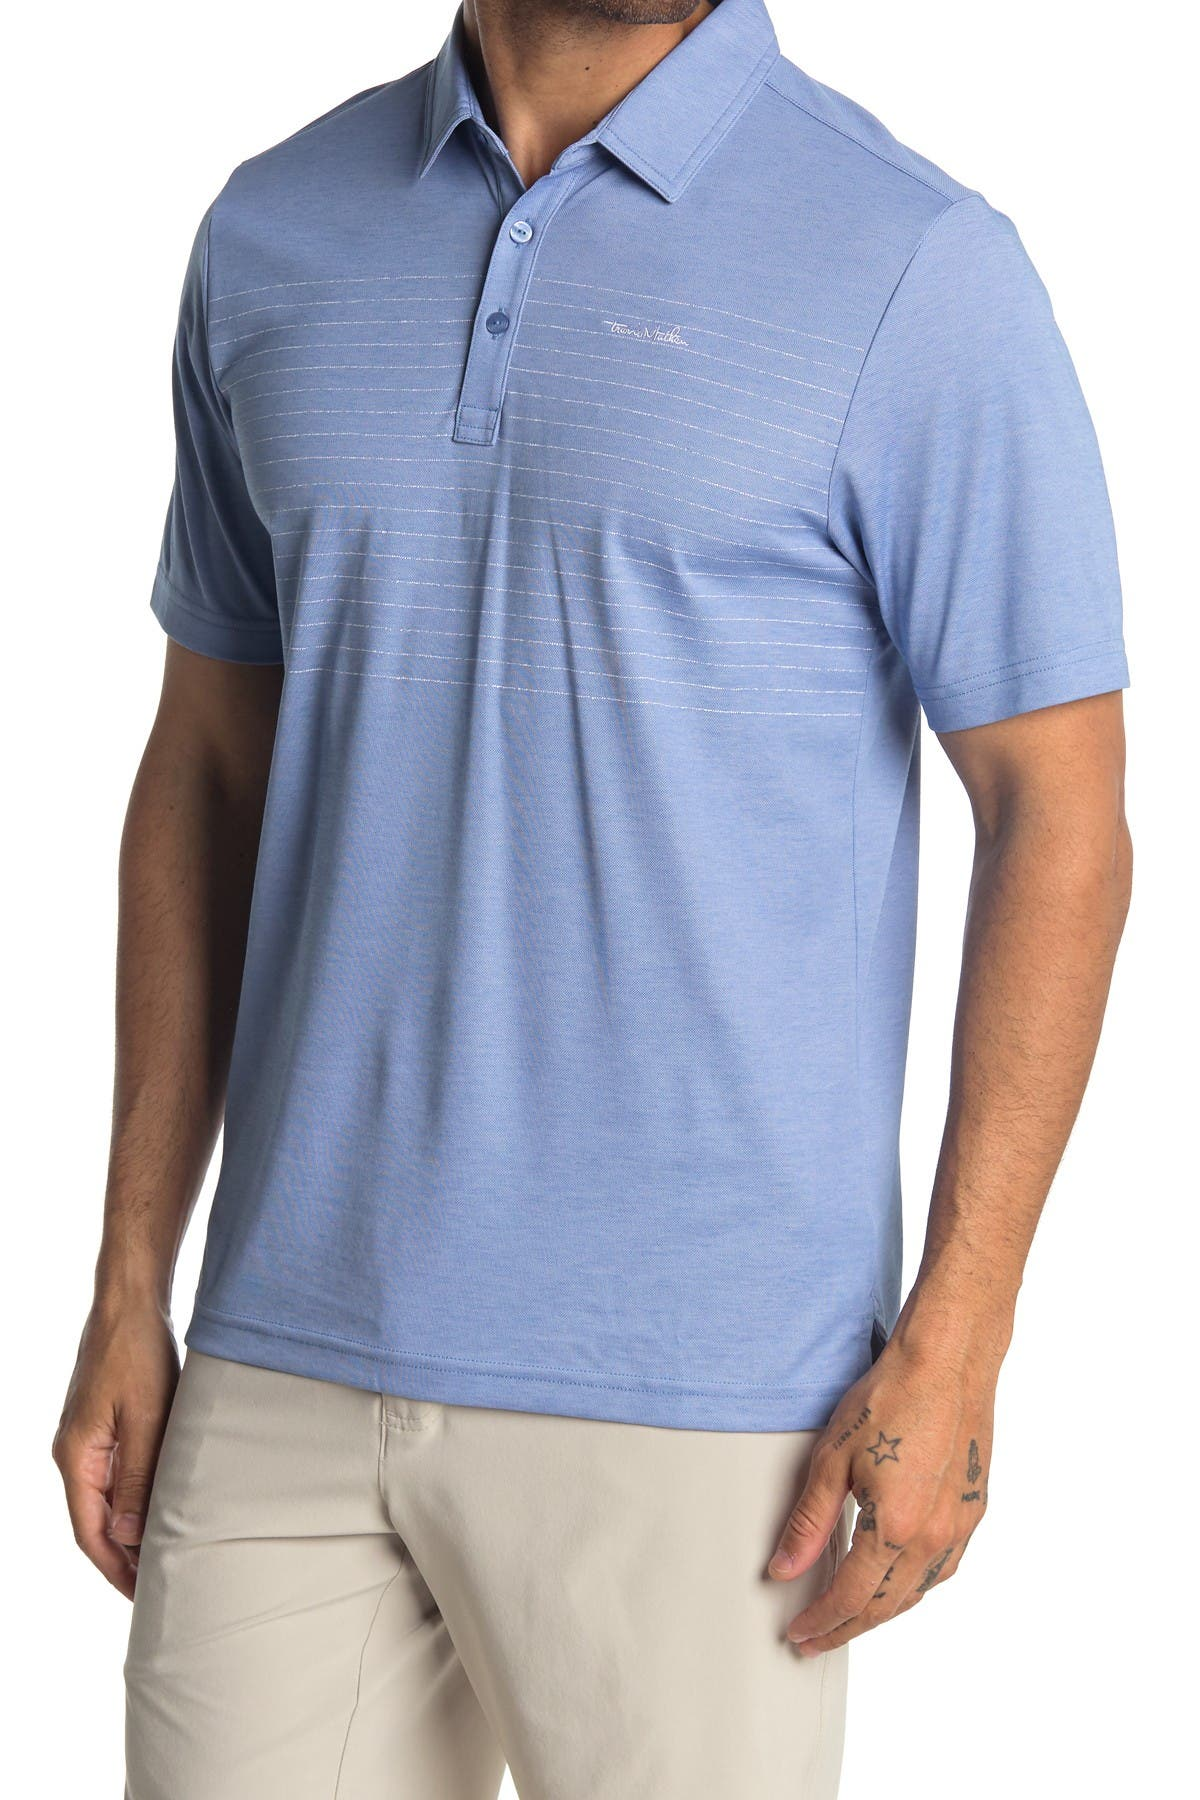 Image of TRAVIS MATHEW Barton Creek Polo Shirt